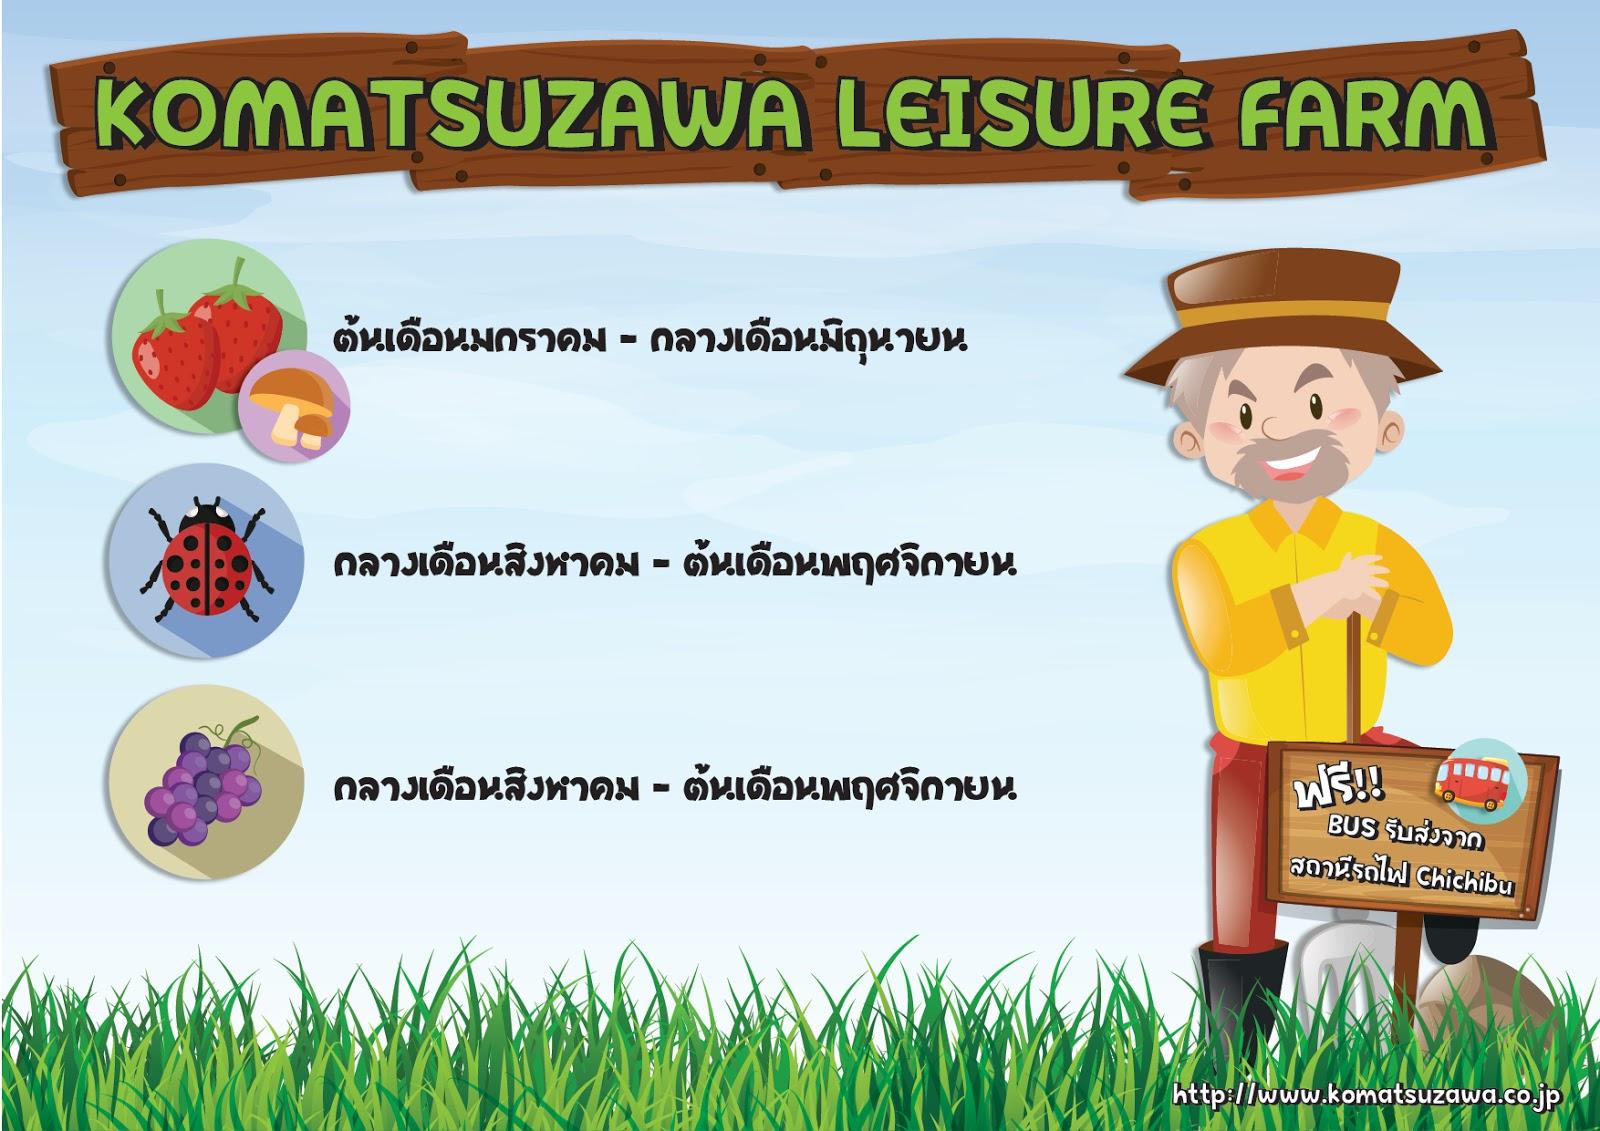 Komatsuzawa Leisure Farm 18